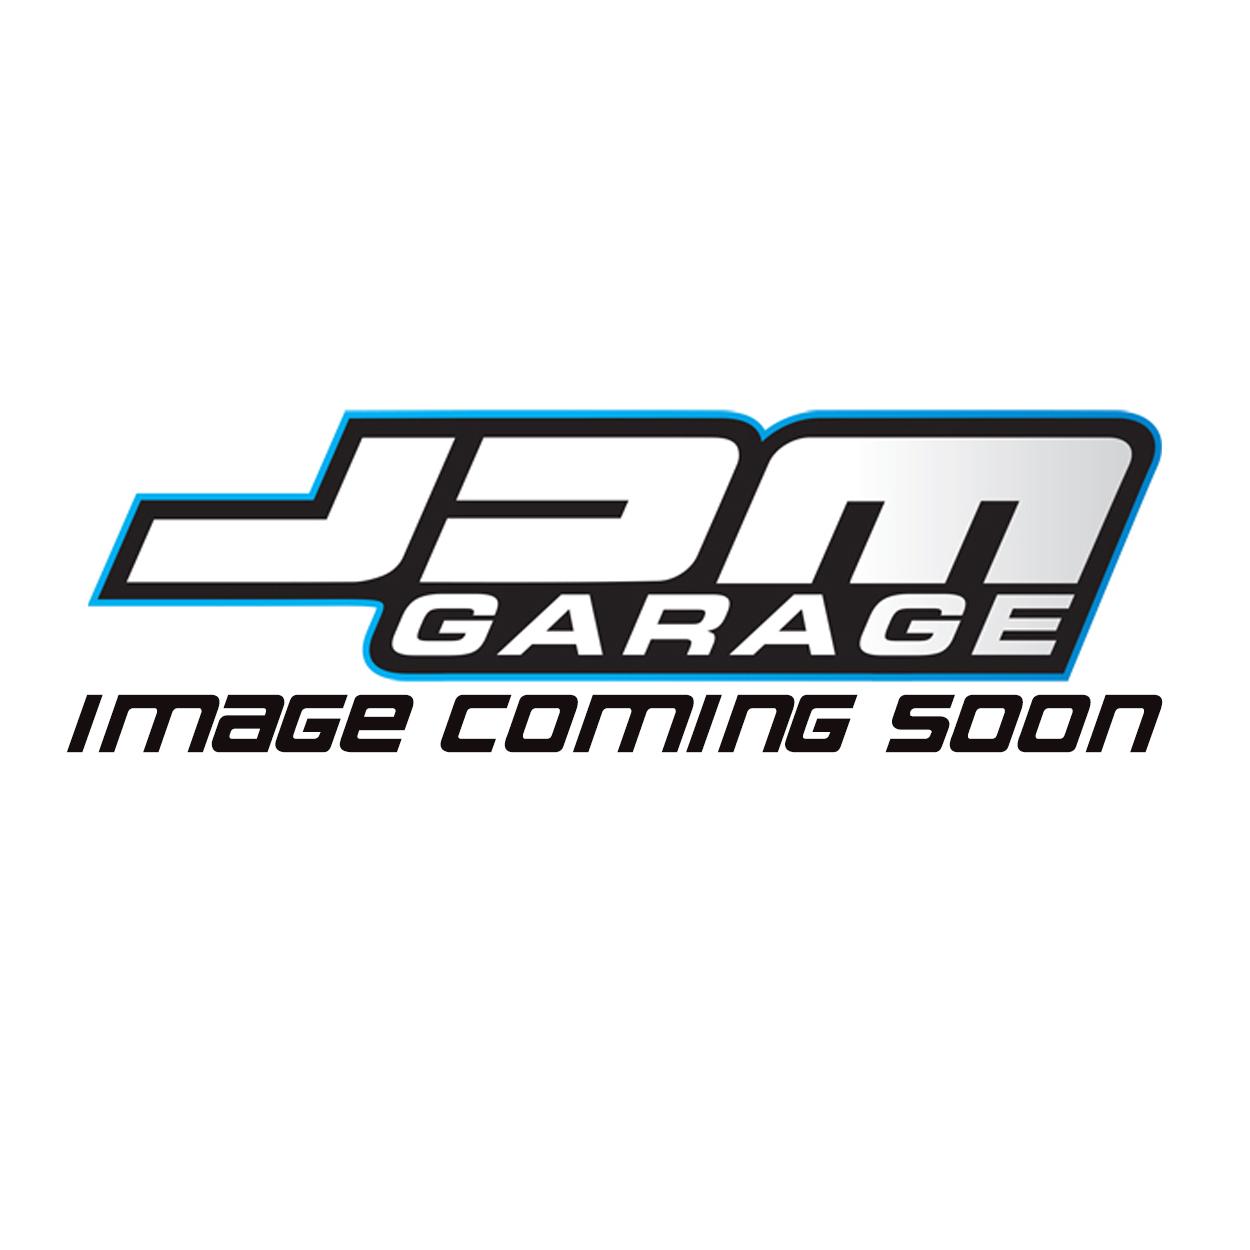 Genuine Nissan Bonnet Rubber Stopper 2 For Silvia S13 S14 S15 90824-15F00